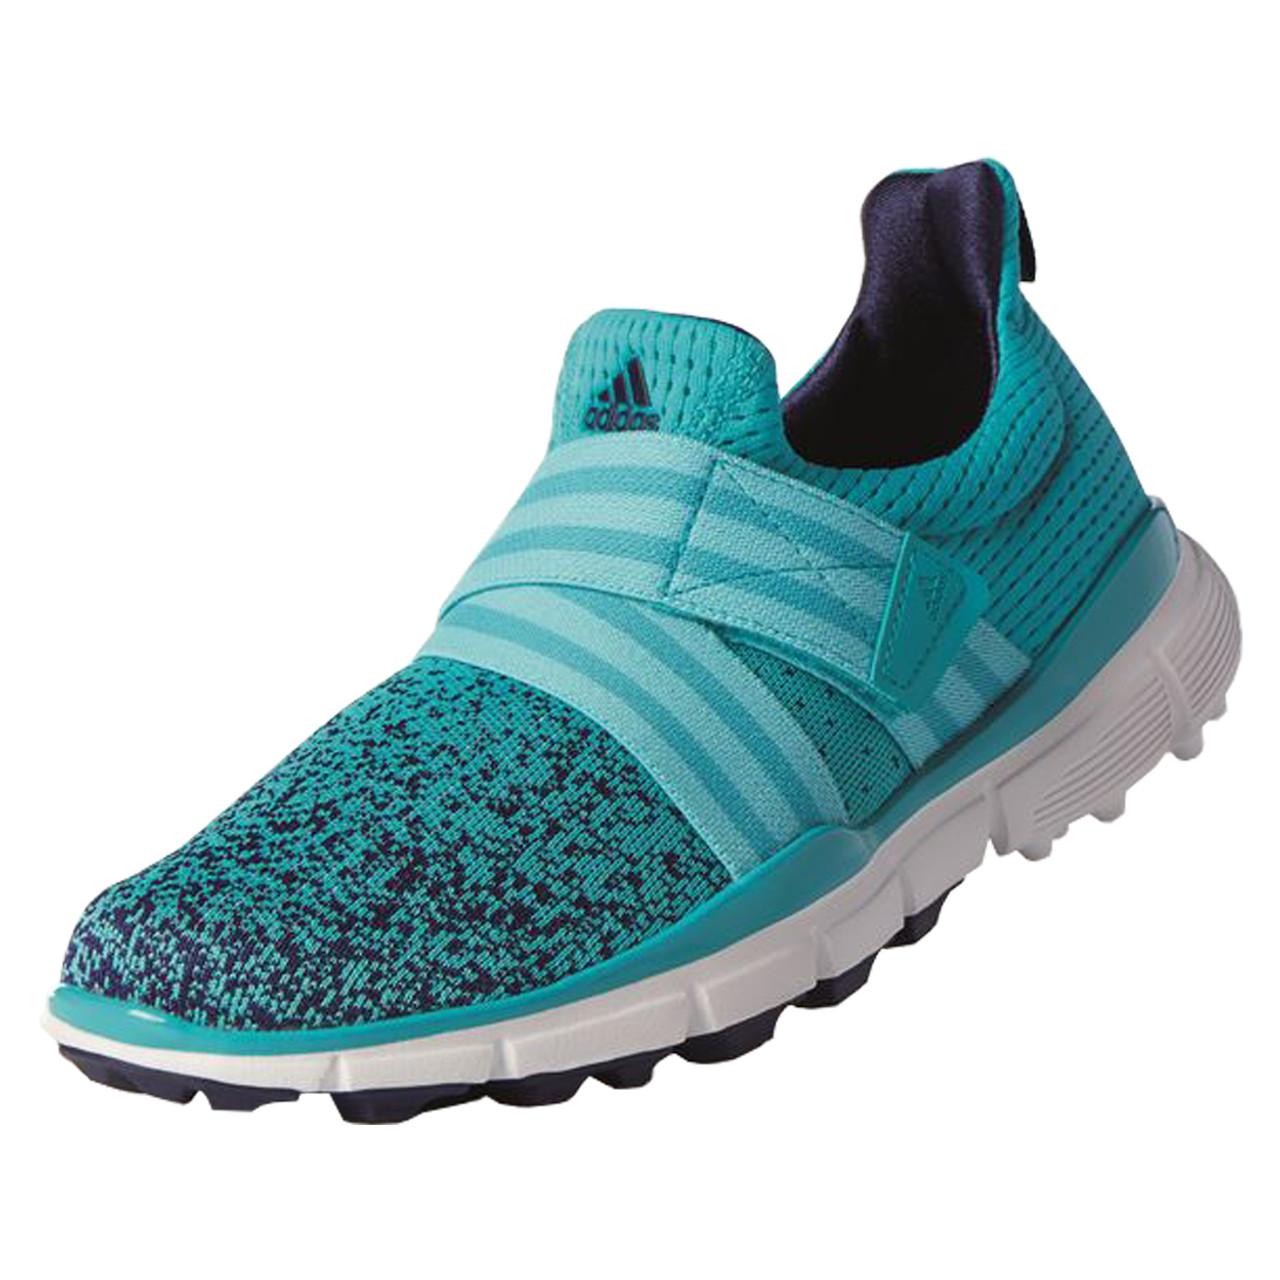 online retailer 7bae0 30a7b Adidas ClimaCool Knit Women's Golf Shoe